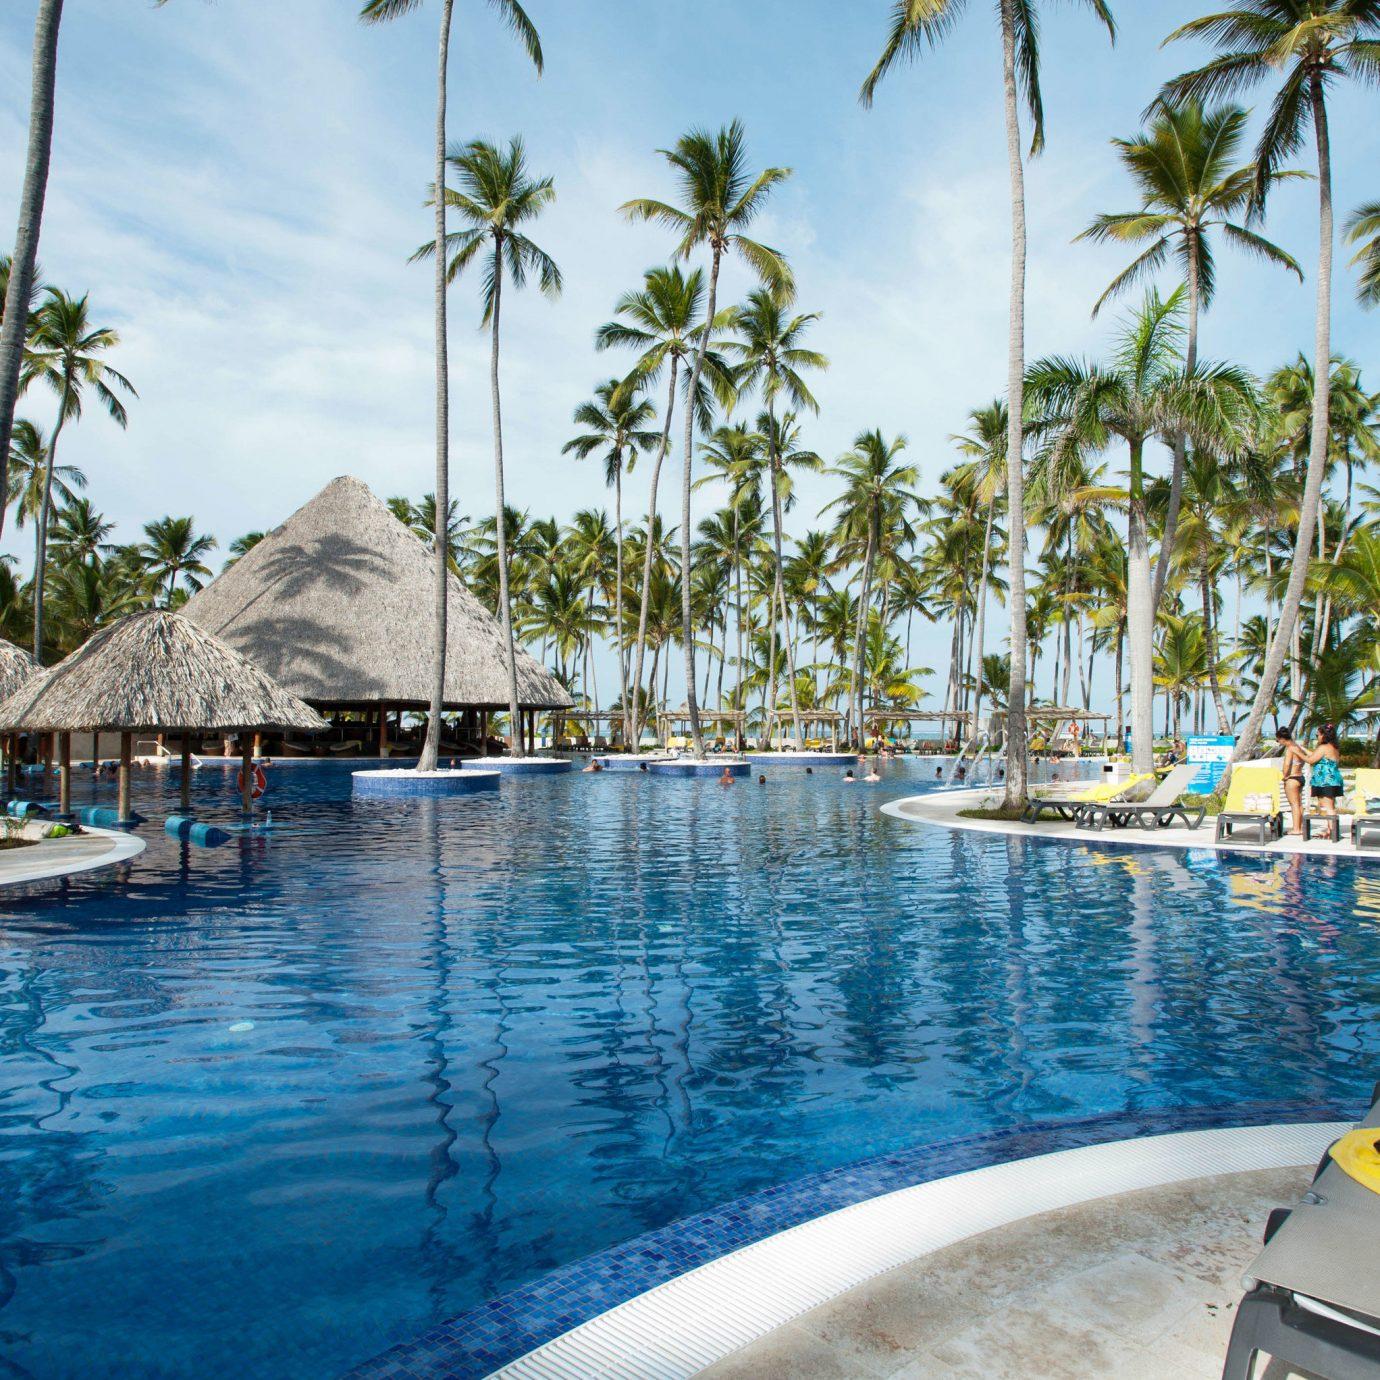 tree water sky leisure swimming pool Boat Resort Pool caribbean marina Sea resort town Lagoon swimming dock Beach palm lined